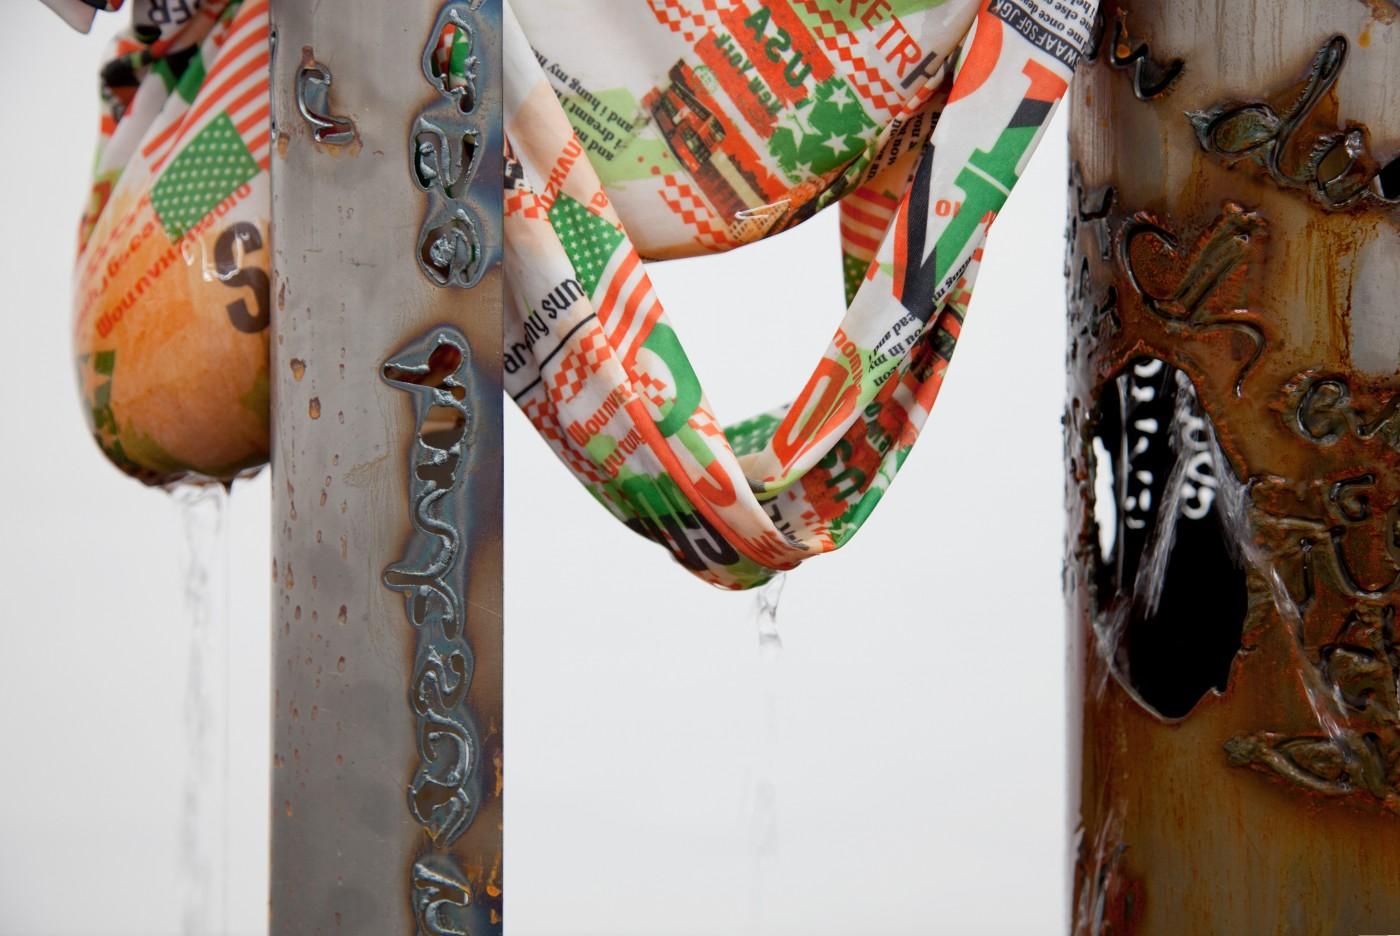 ♥ Olga Balema,  Untitled , 2013 (detail) OLGA BALEMA  DAVID DOUARD  ALLISON KATZ  BRADLEY KRONZ  TOM HUMPHRIES  HAN-CHRISTIAN LOTZ  LAURE PROUVOST